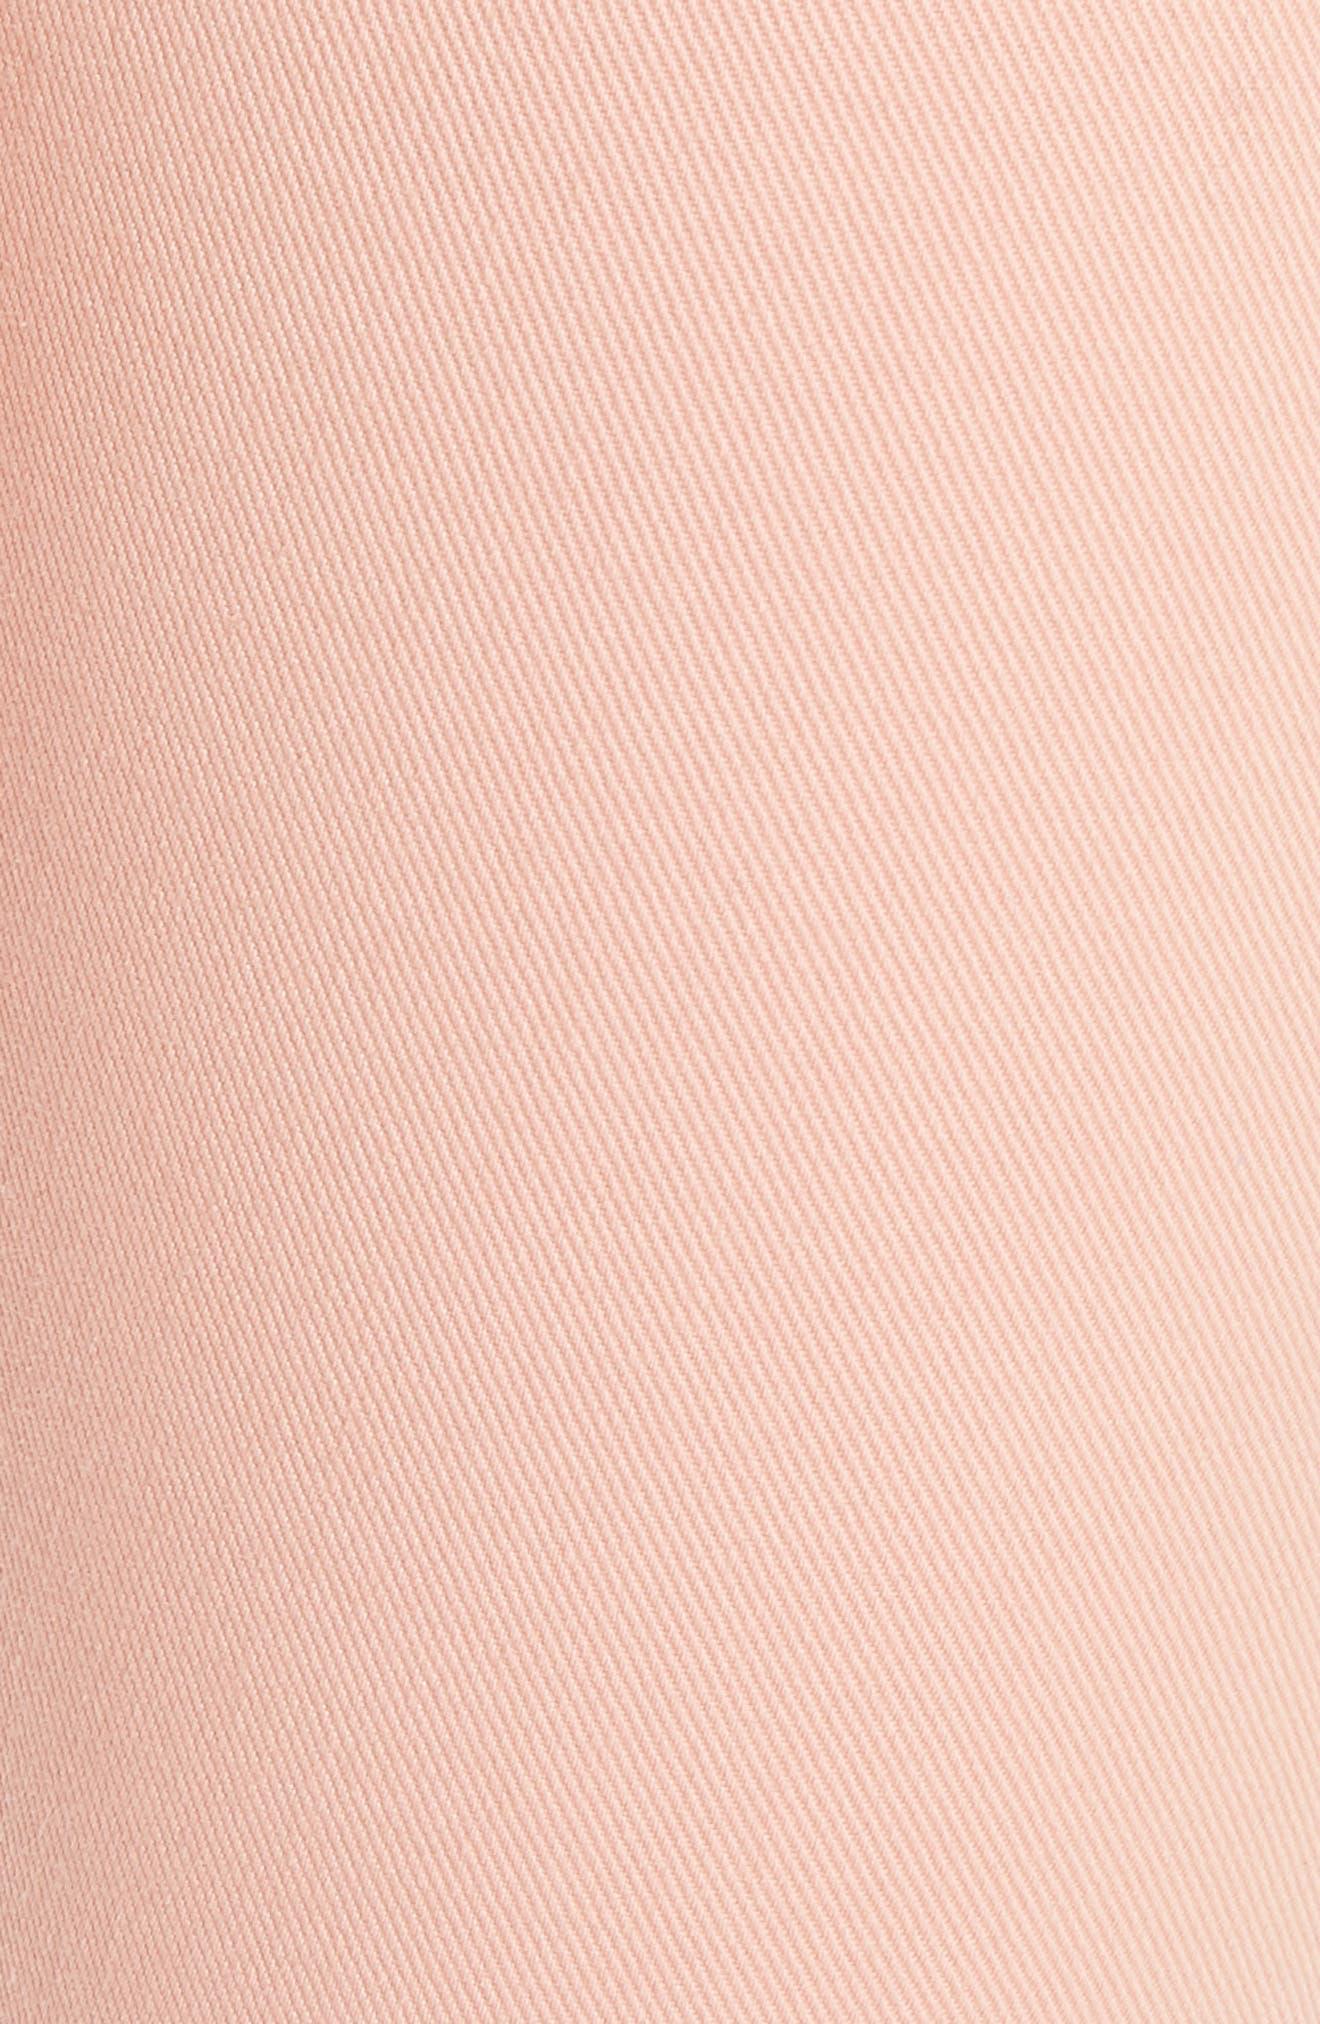 High Waist Skinny Jeans,                             Alternate thumbnail 5, color,                             PEACH/ LILAC